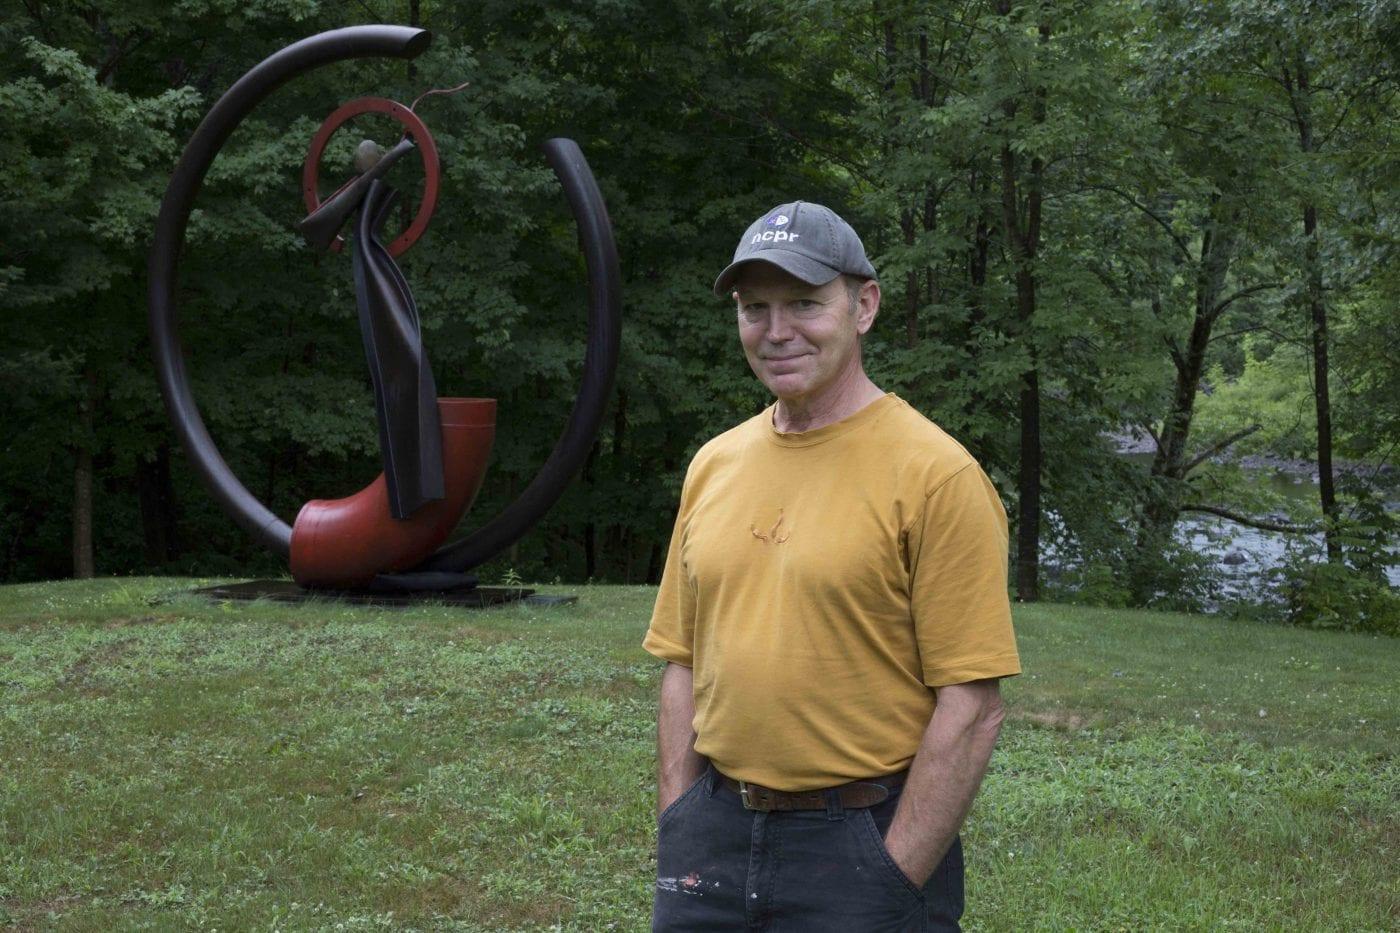 Artist John Van Alstine uses nature as inspiration